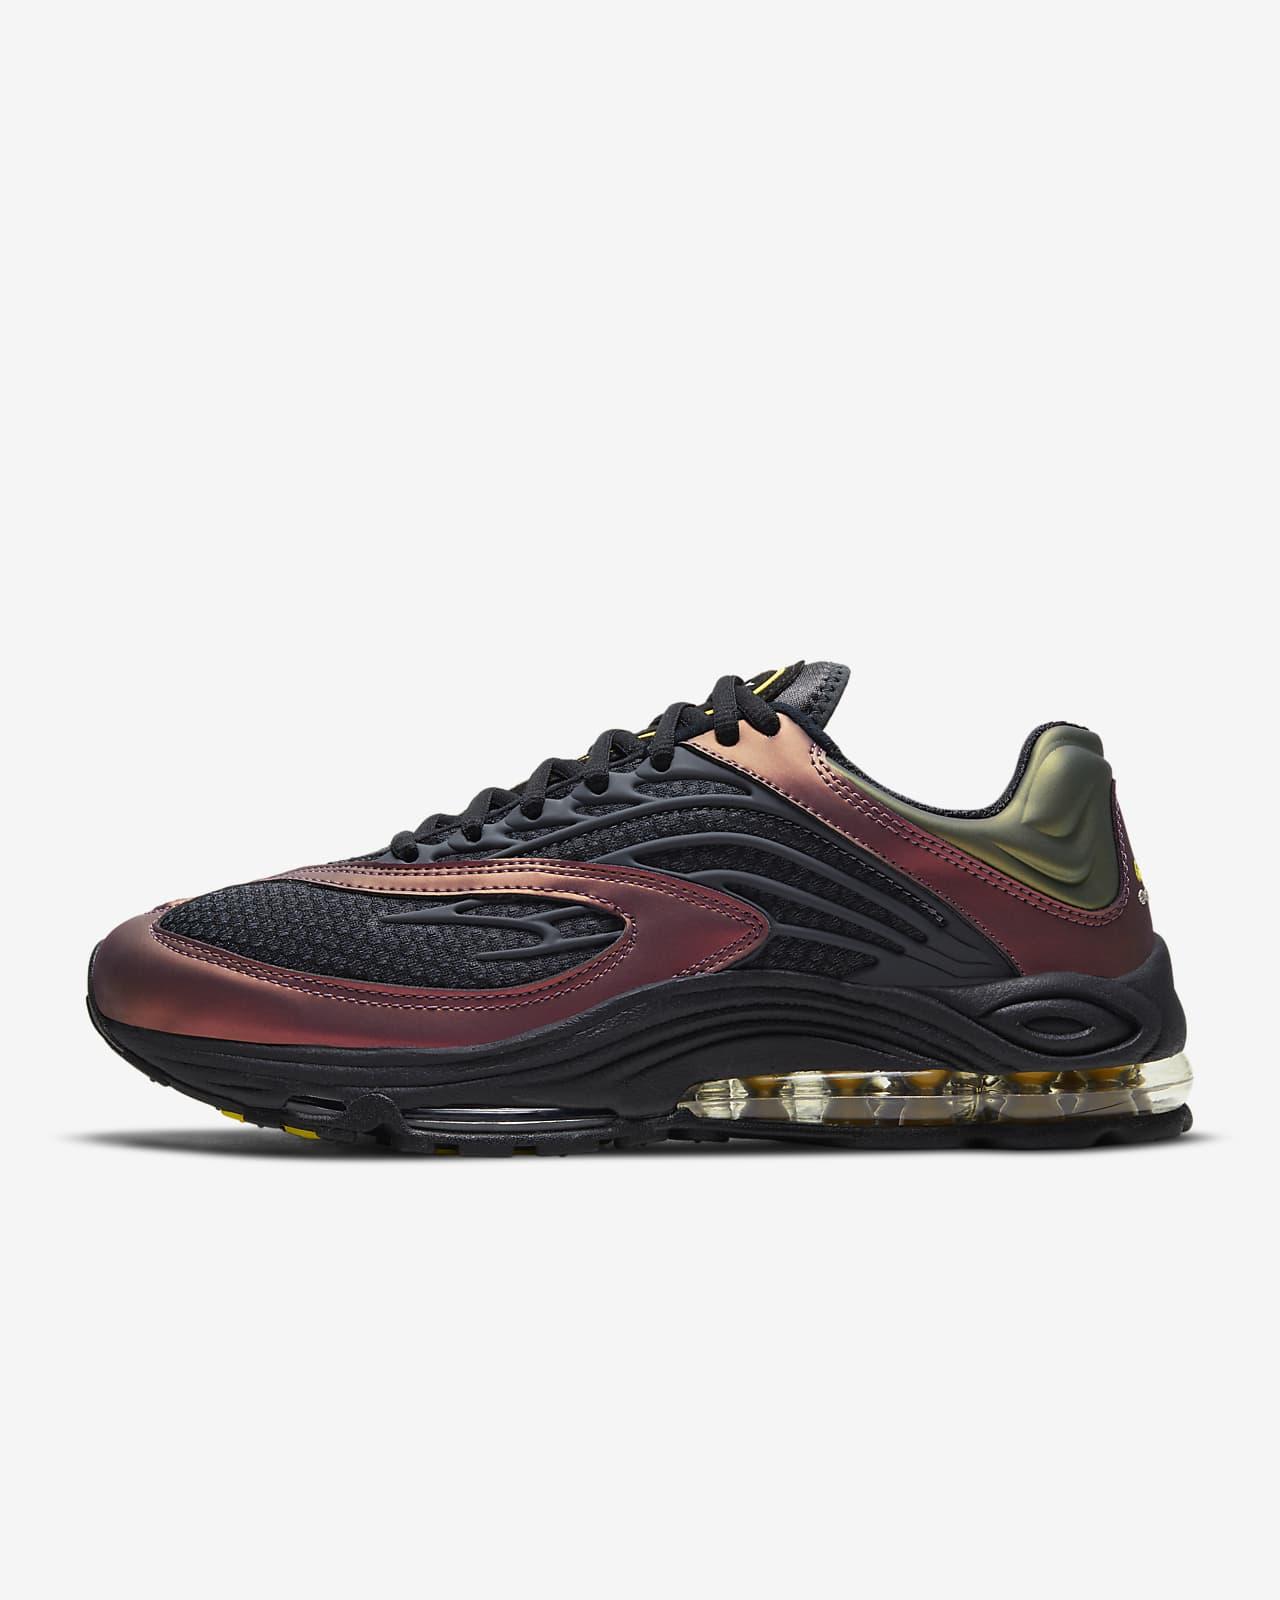 Nike Air Tuned Max Men's Shoe